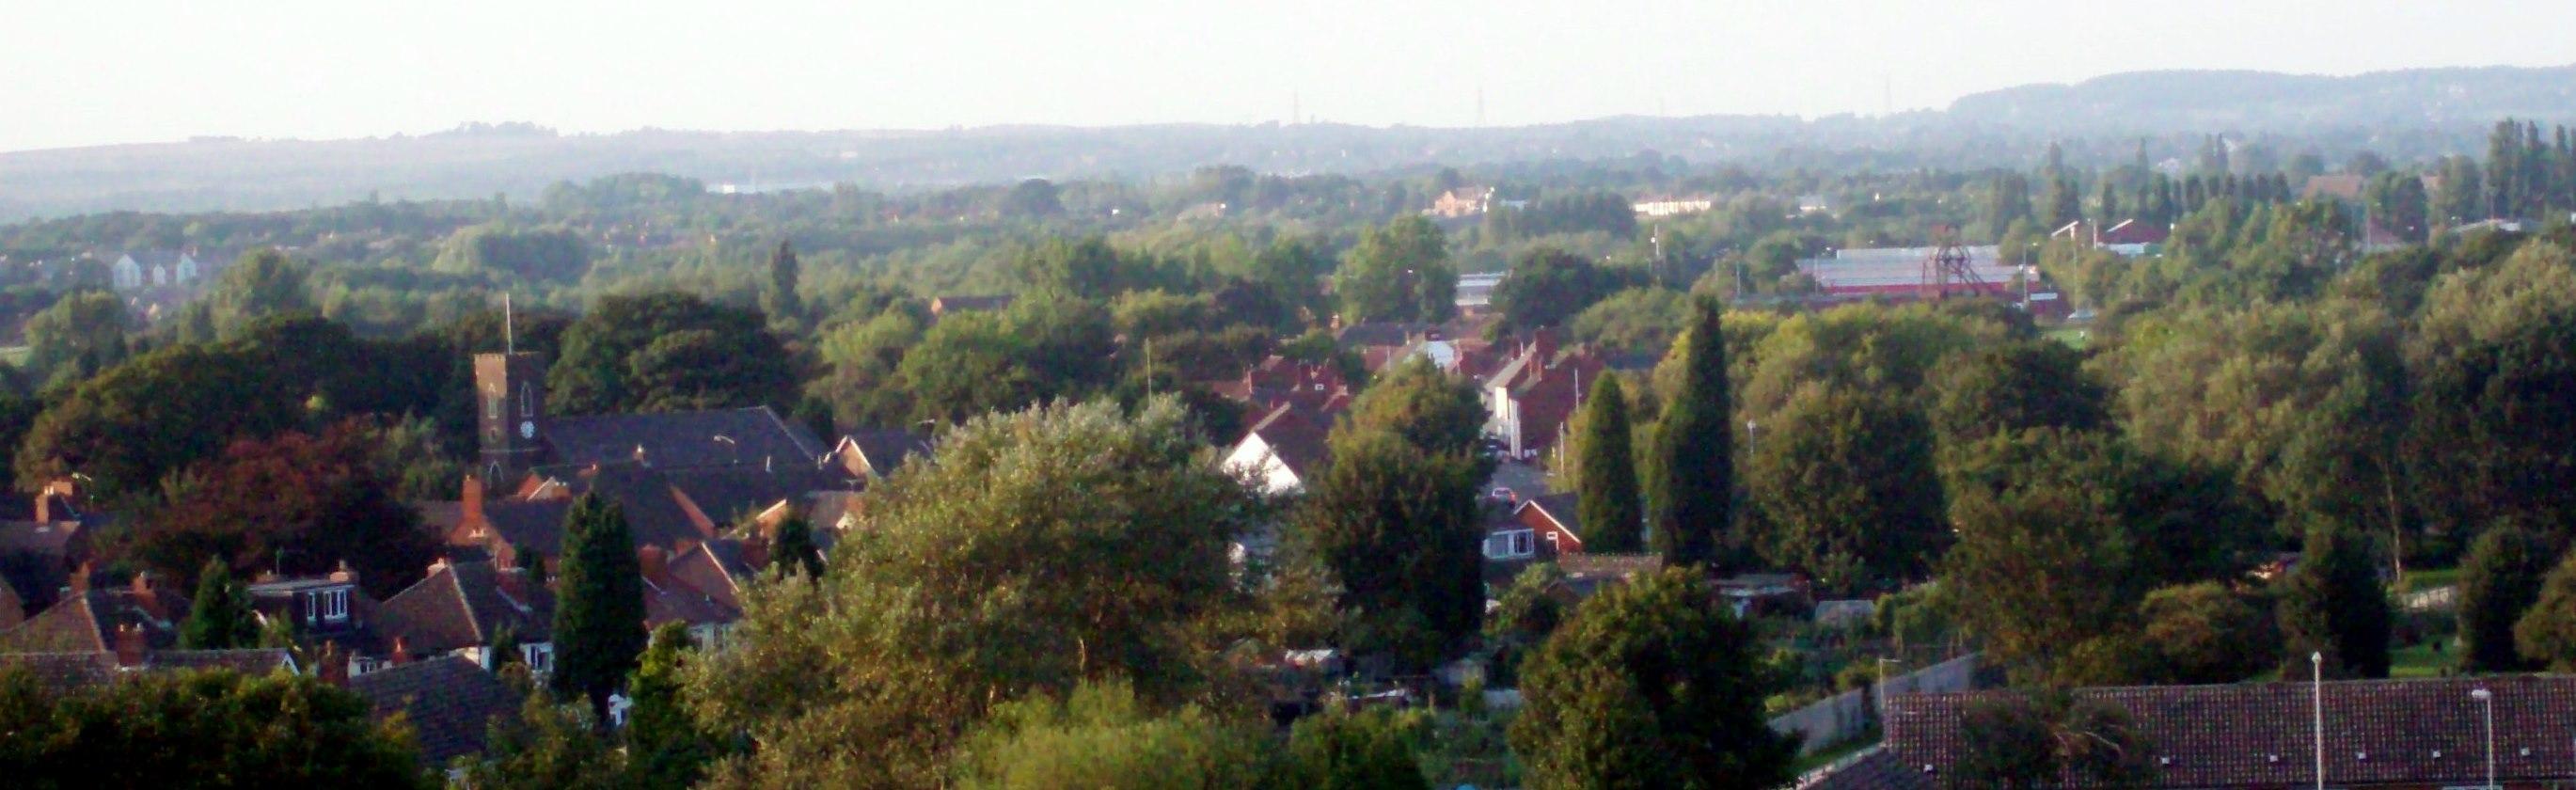 Walsall, UK